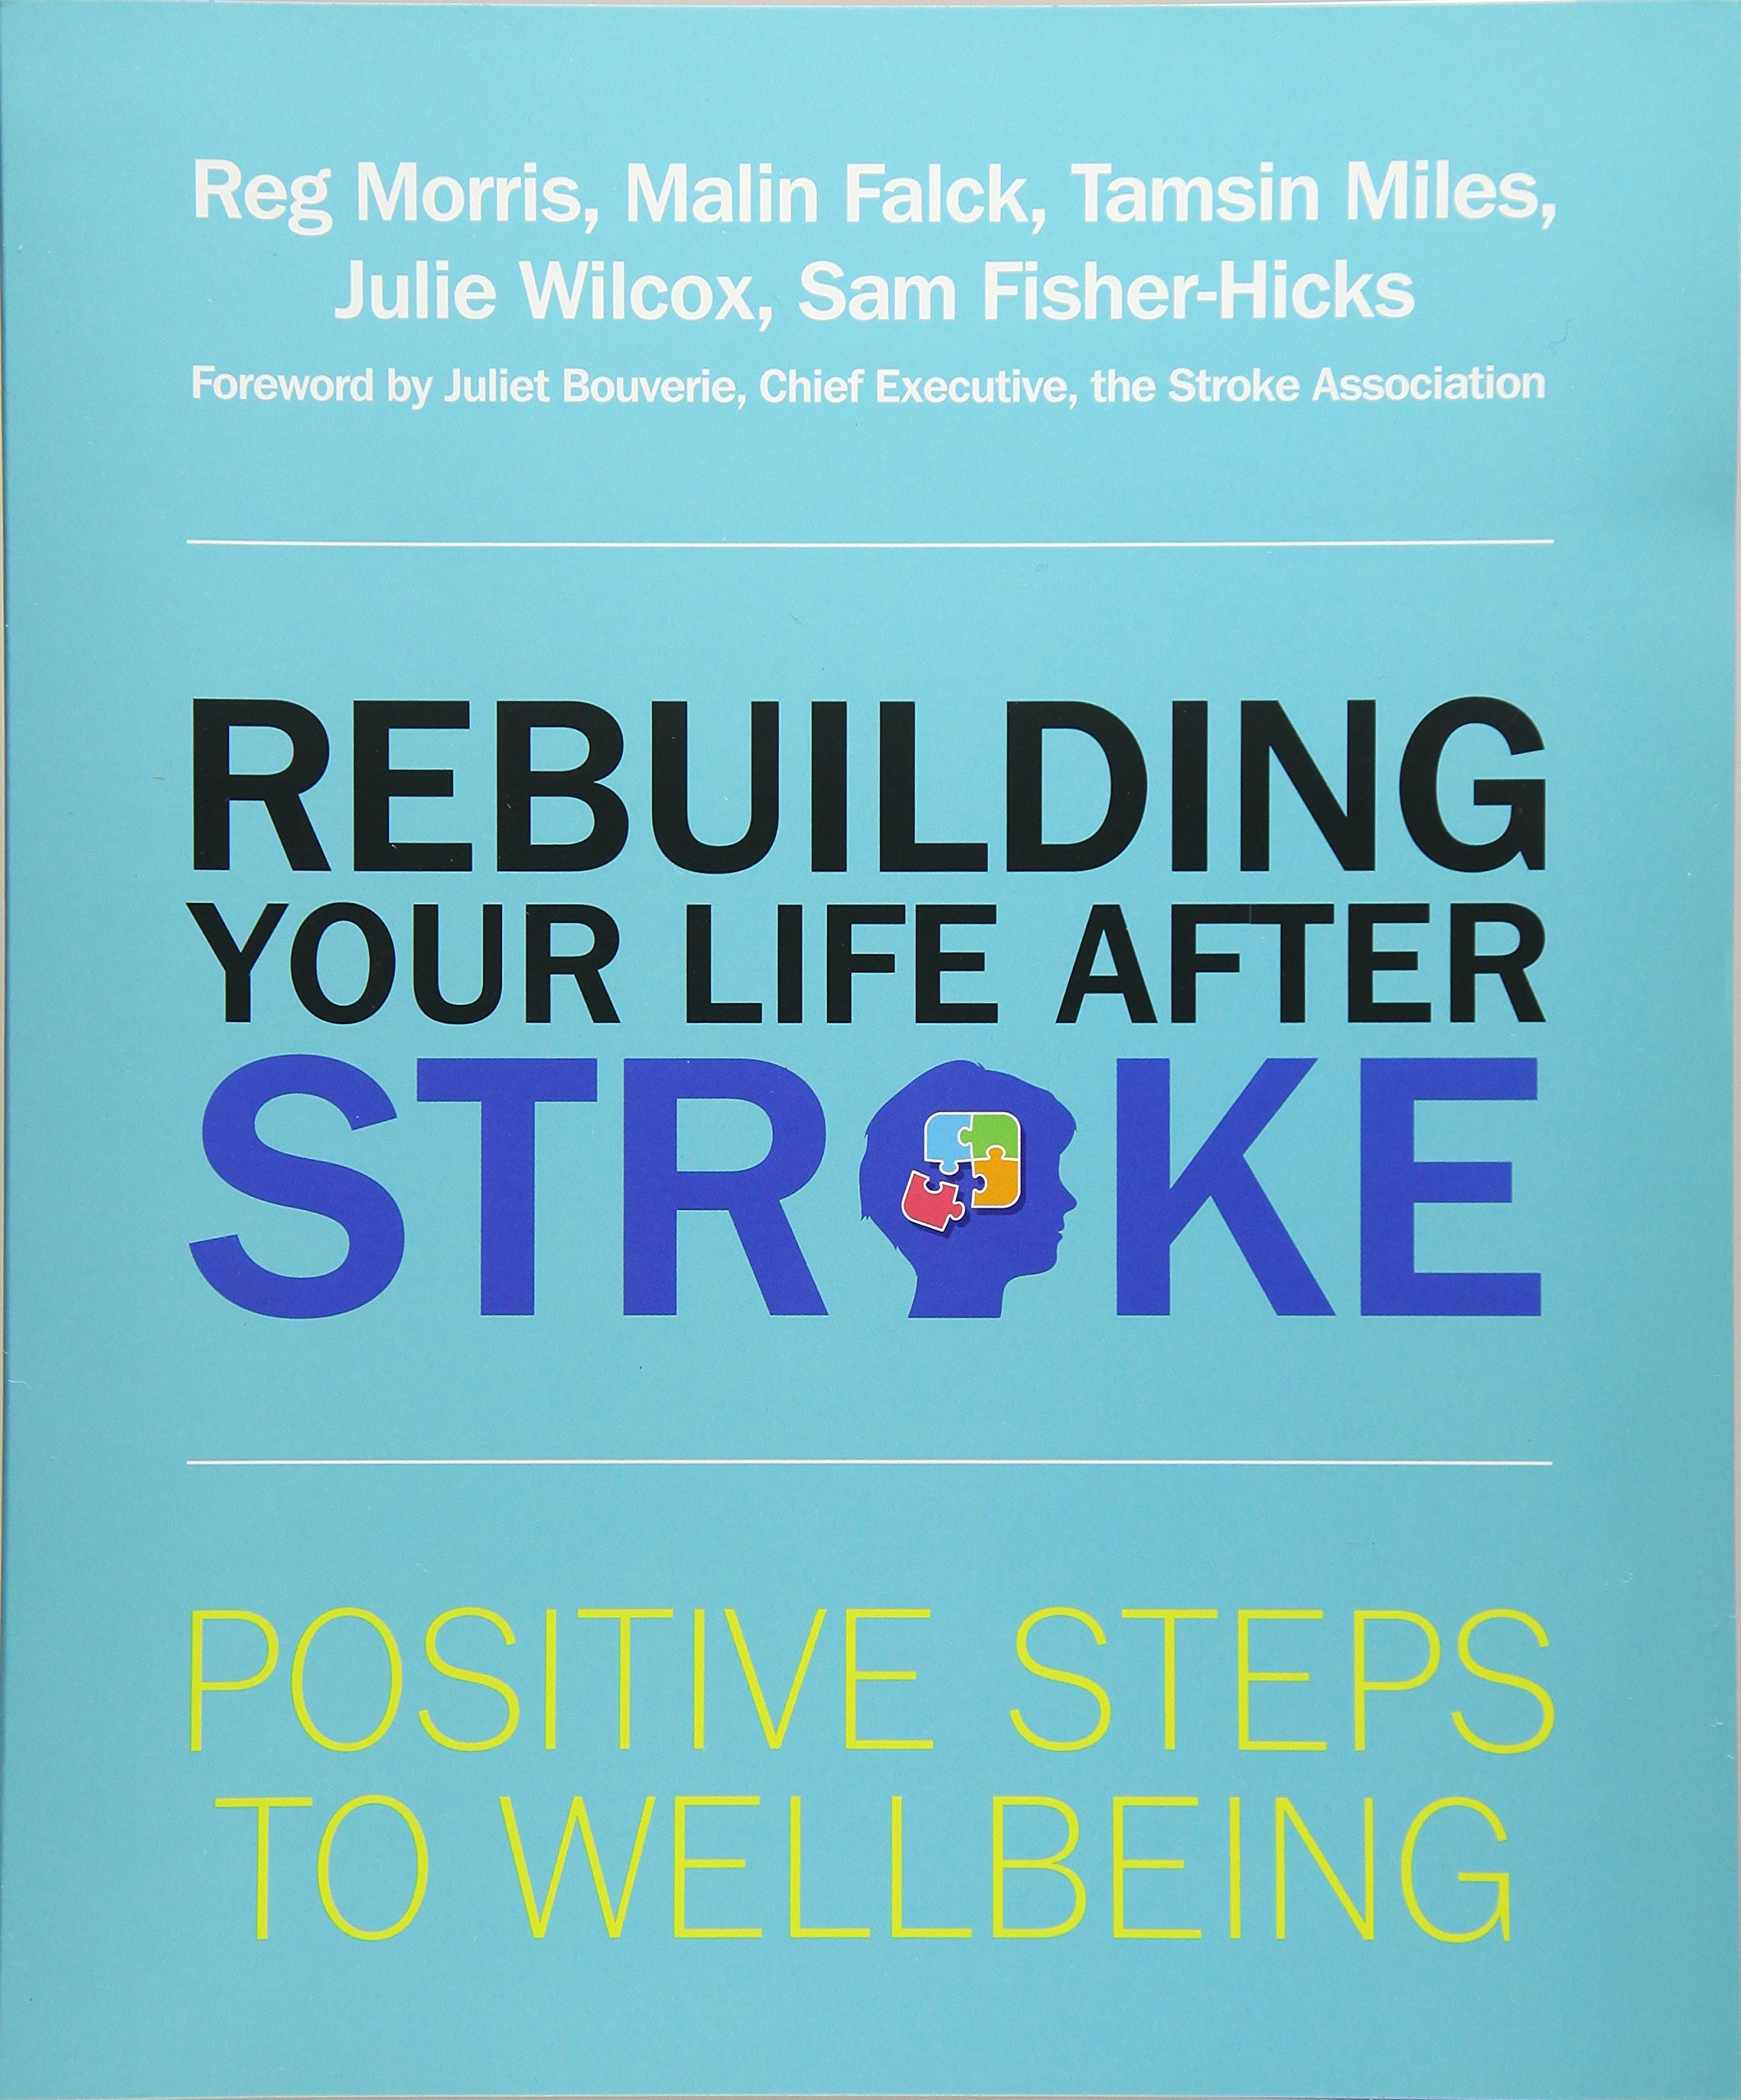 Rebuilding Your Life after Stroke: Positive Steps to